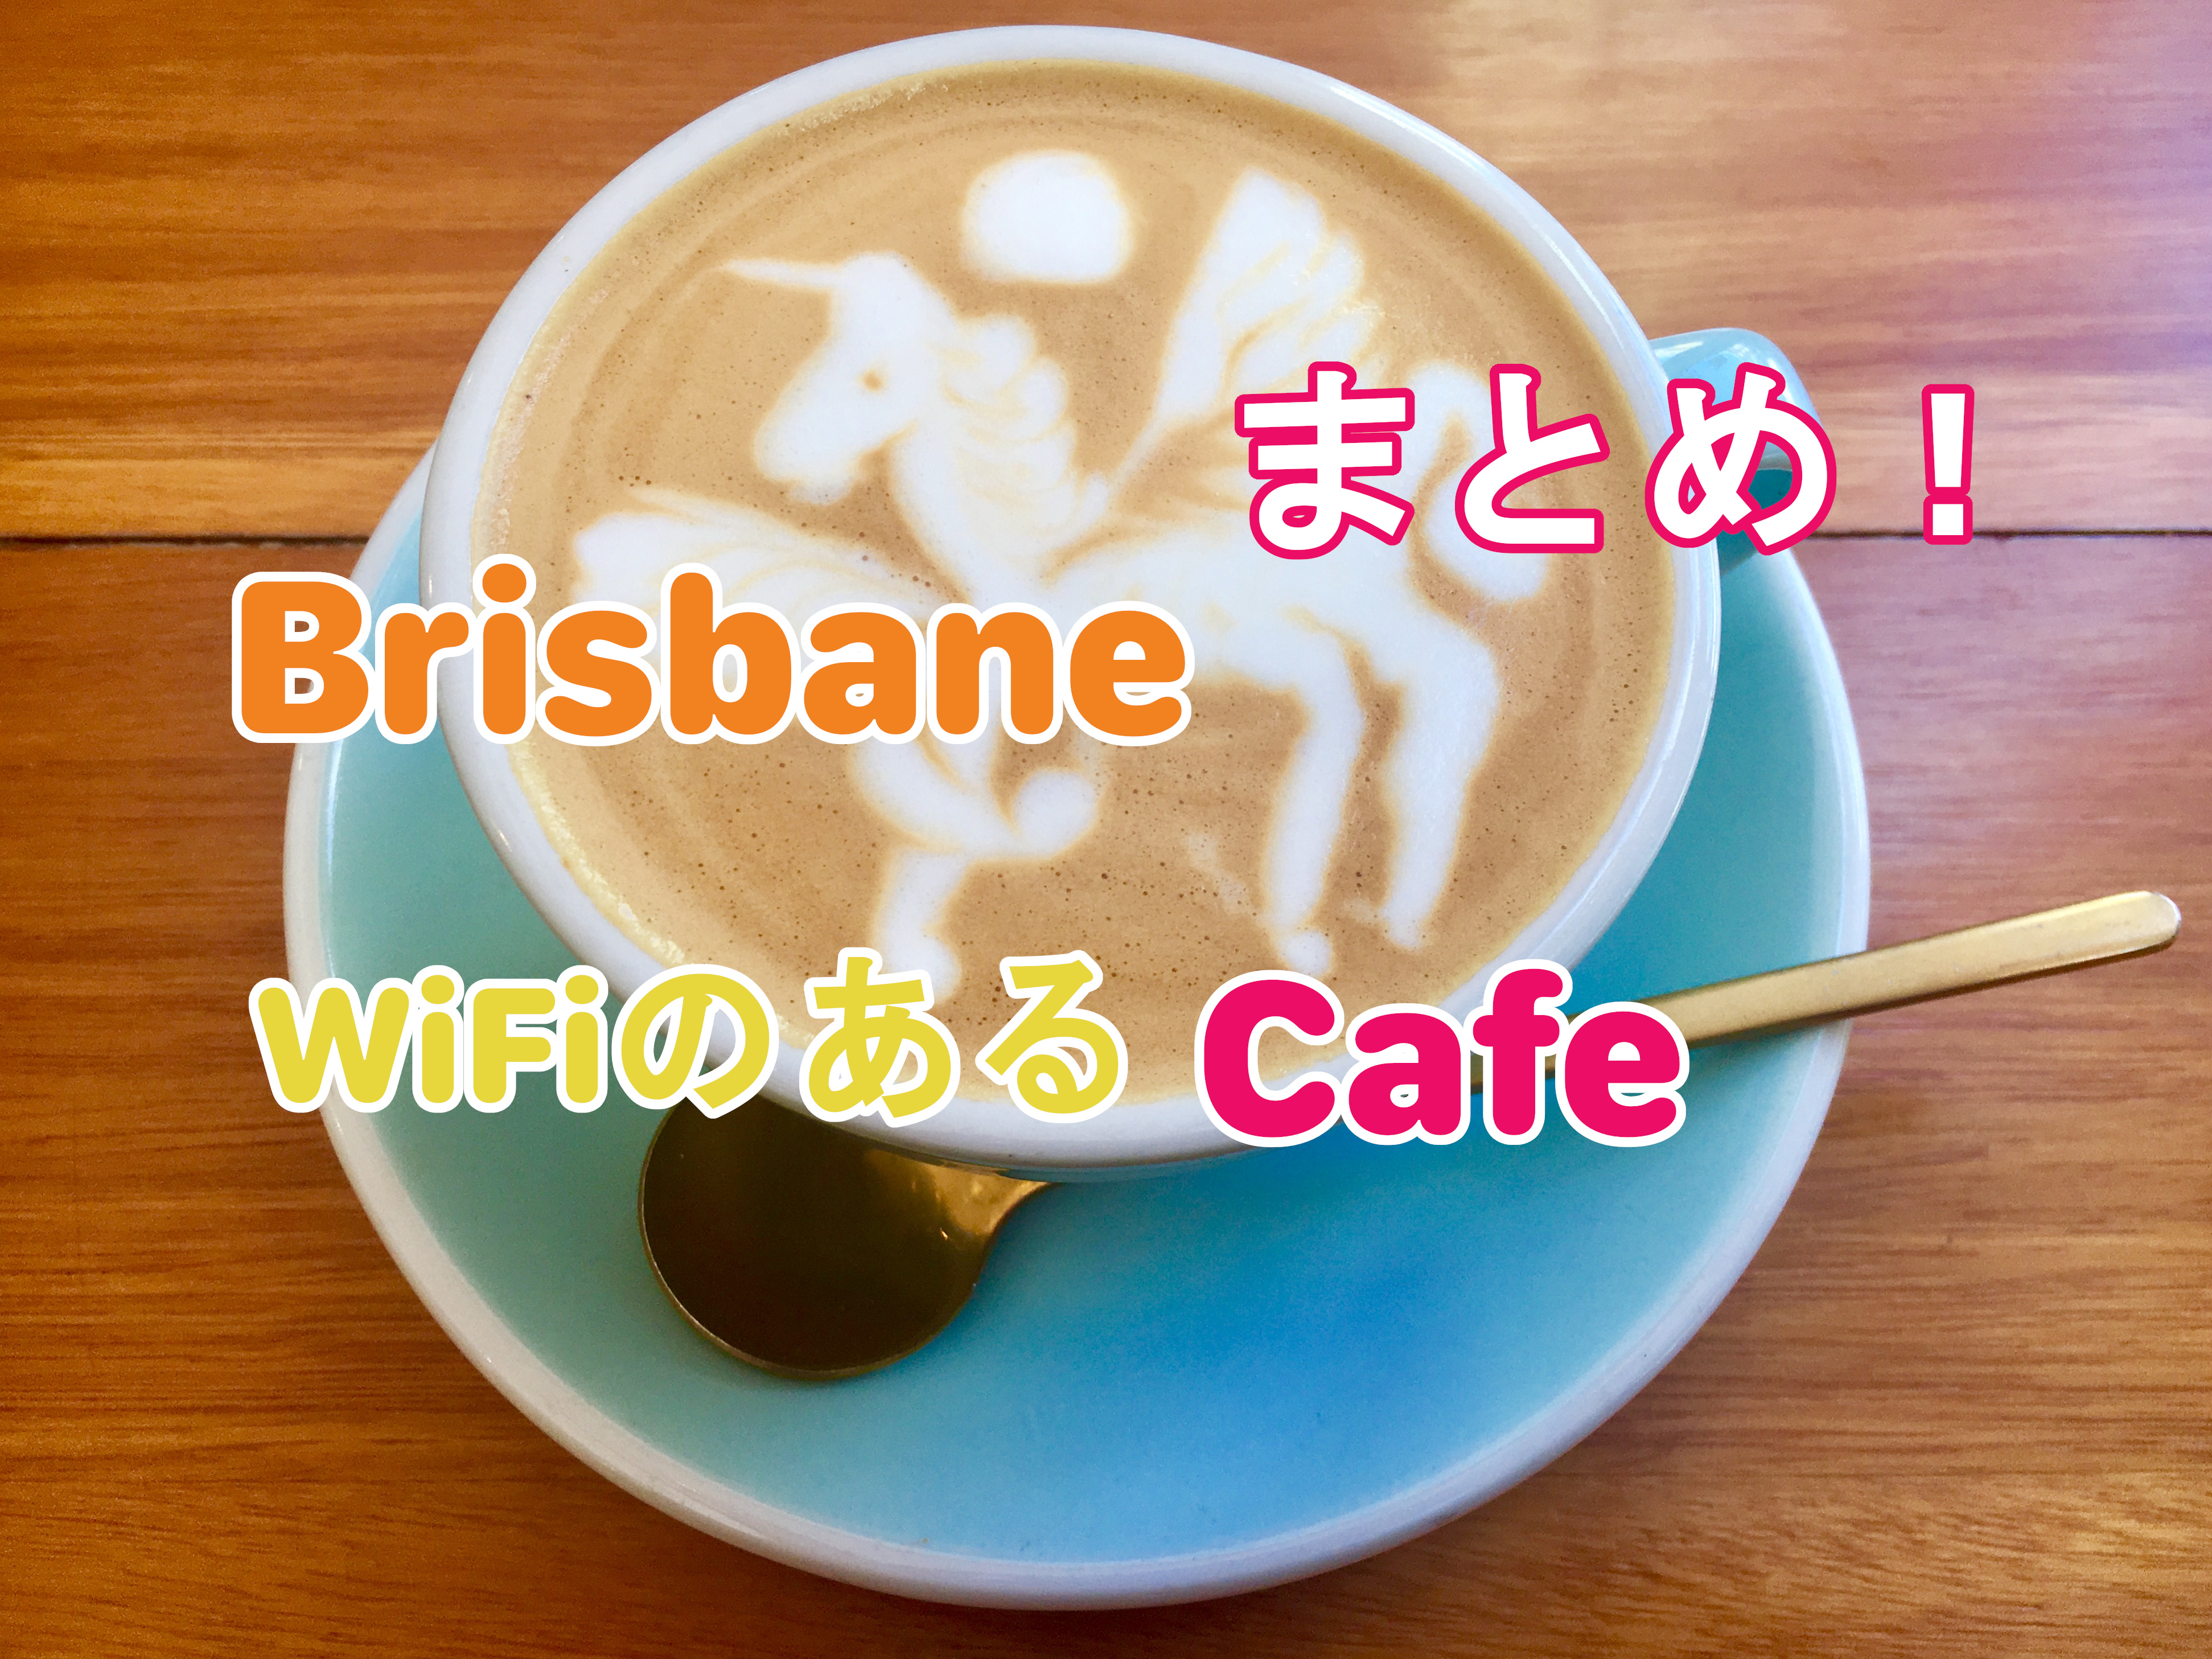 BrisbaneのWifiがあるカフェまとめ